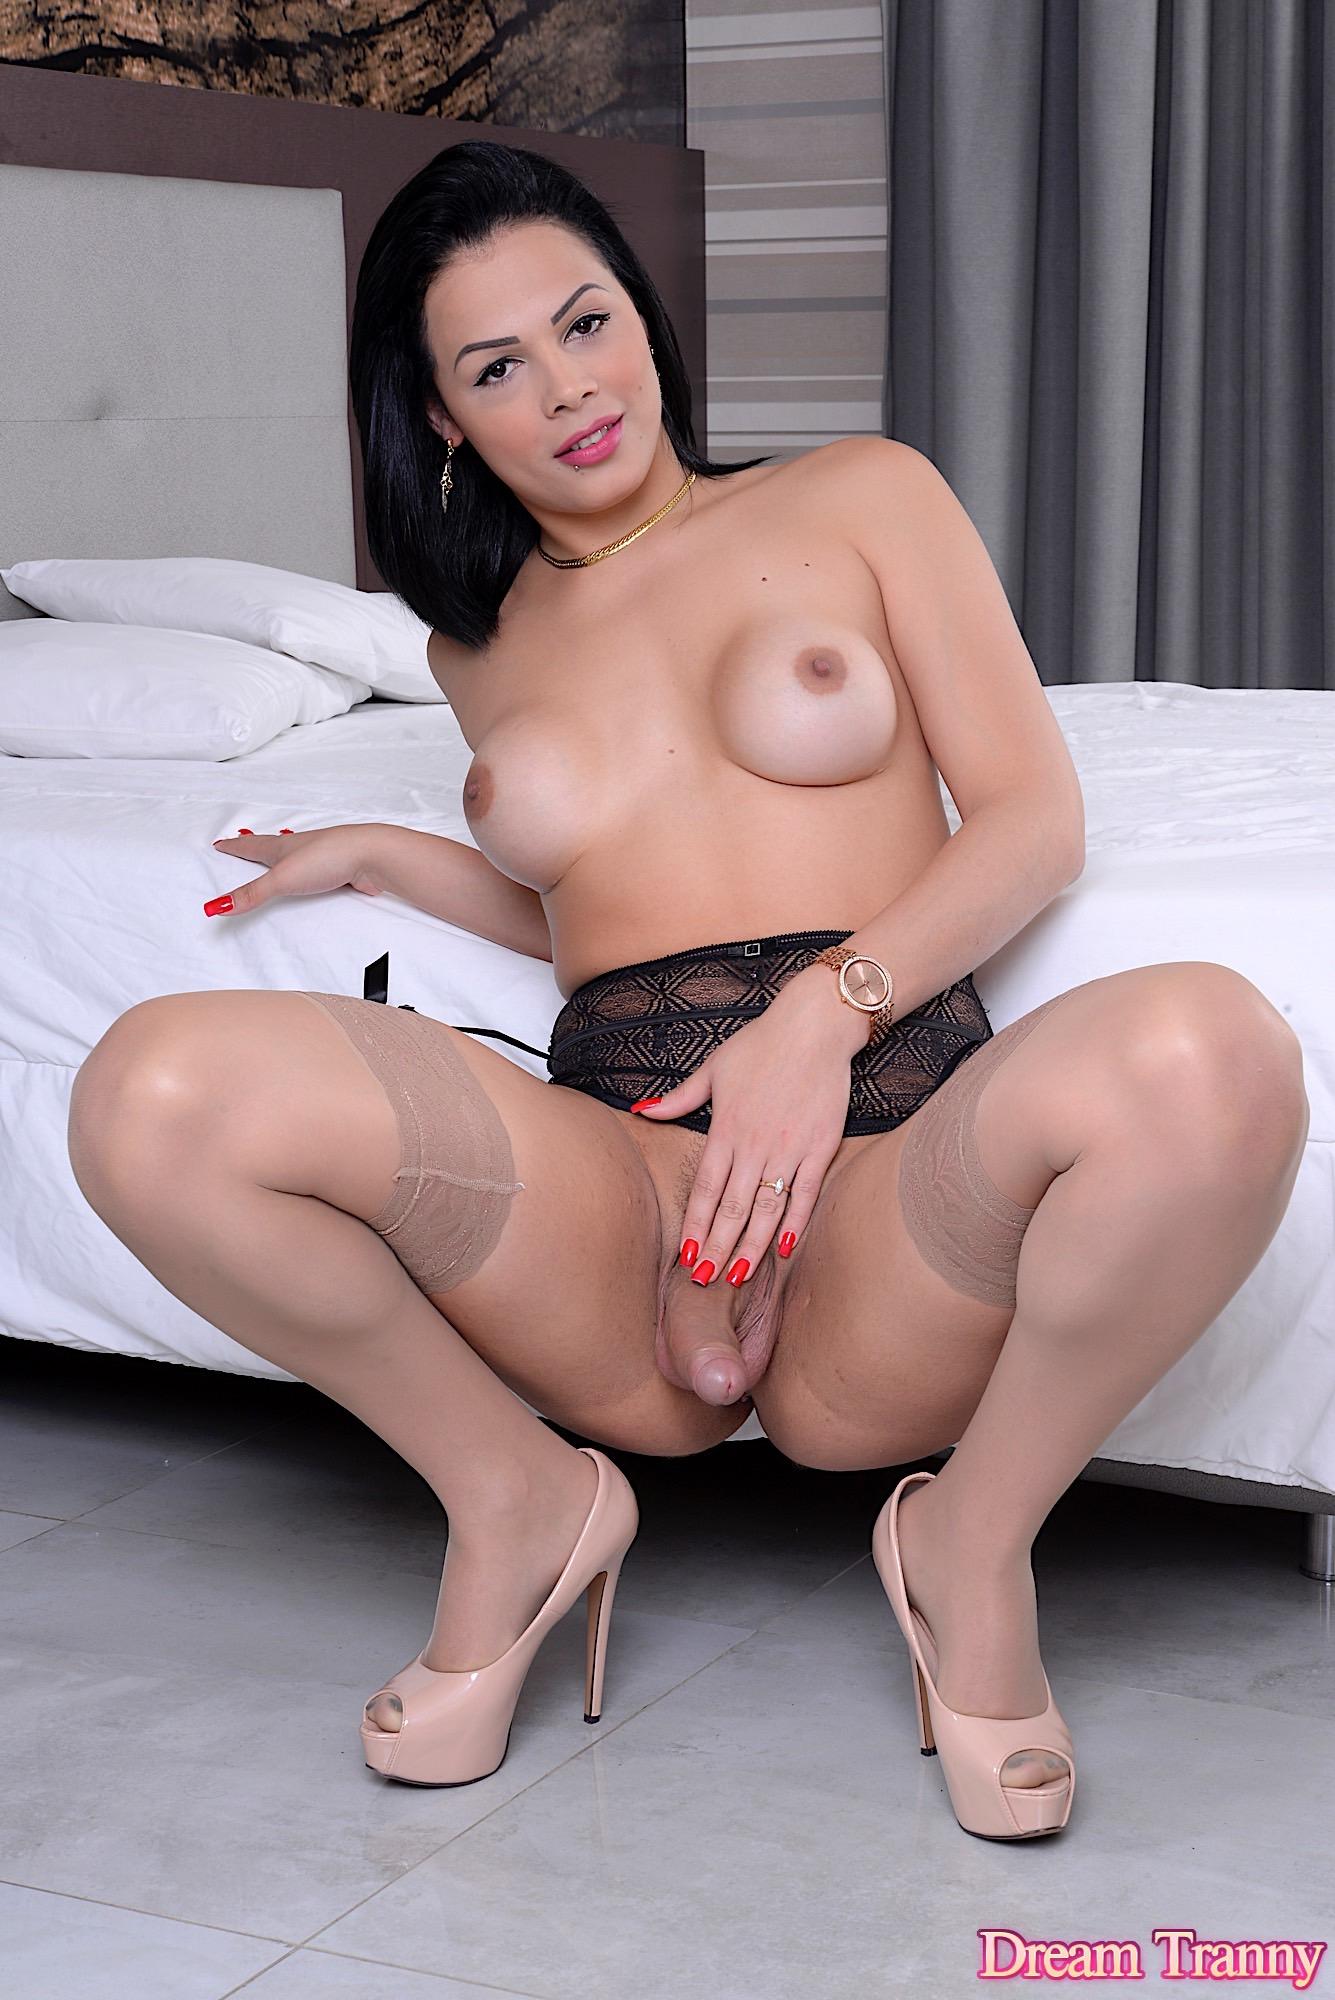 Bruna tranny pantyhose sex video gladys sexy